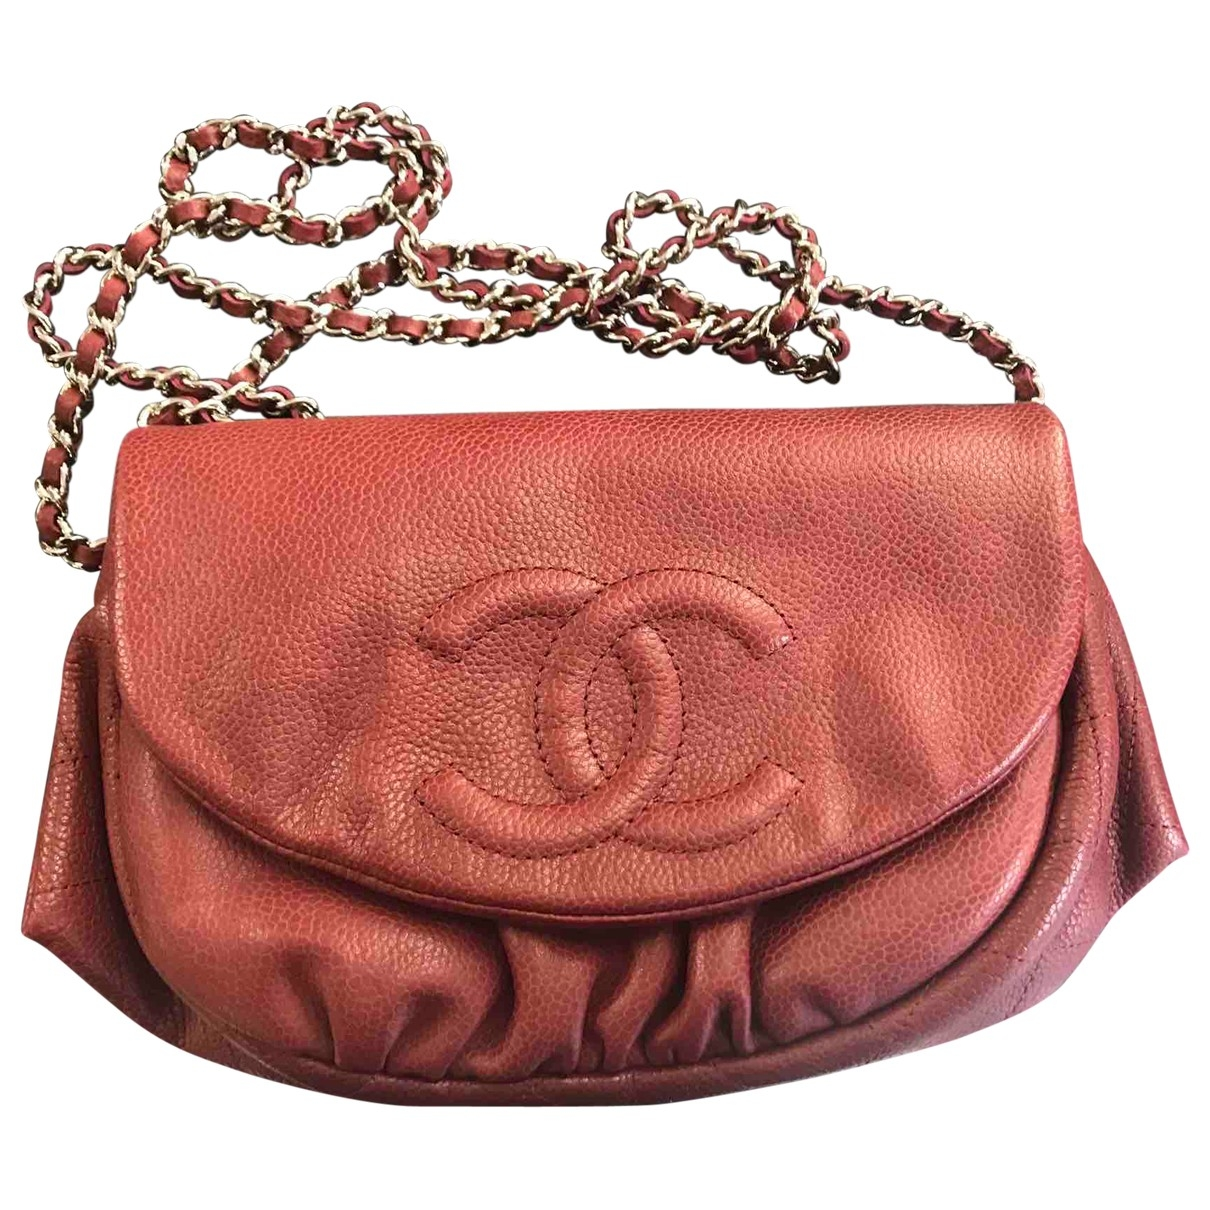 Chanel \N Handtasche in  Bordeauxrot Leder